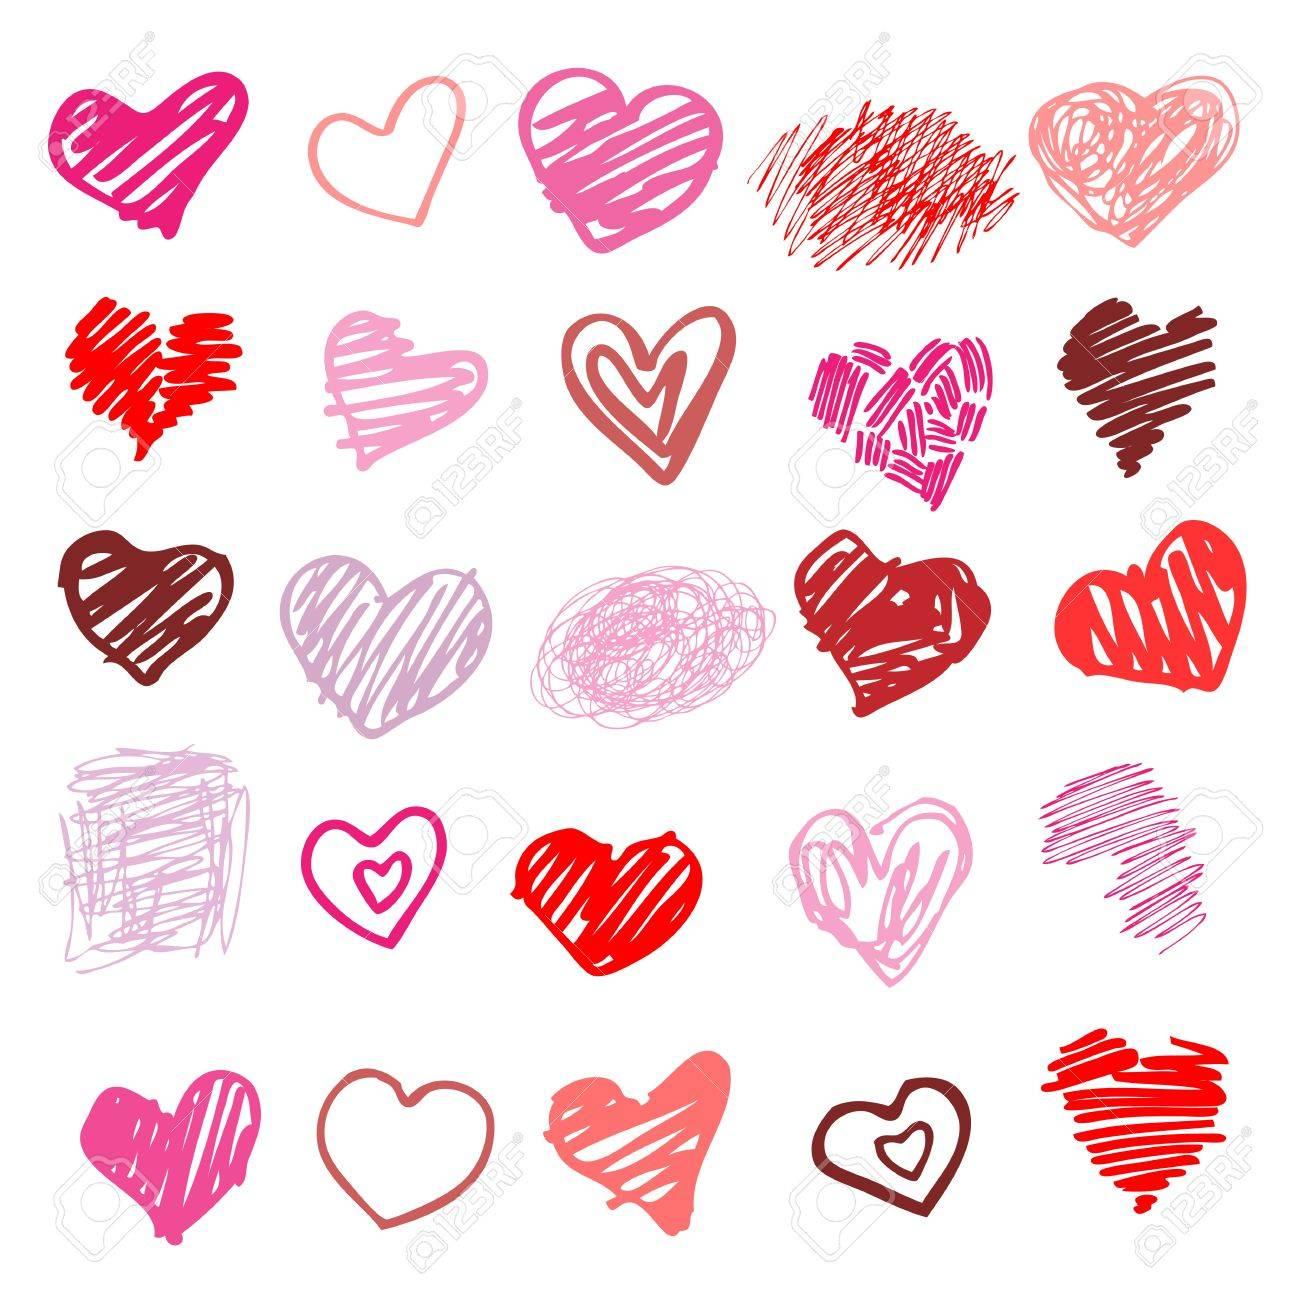 Heart  Set of design elements    illustration Stock Vector - 16407168